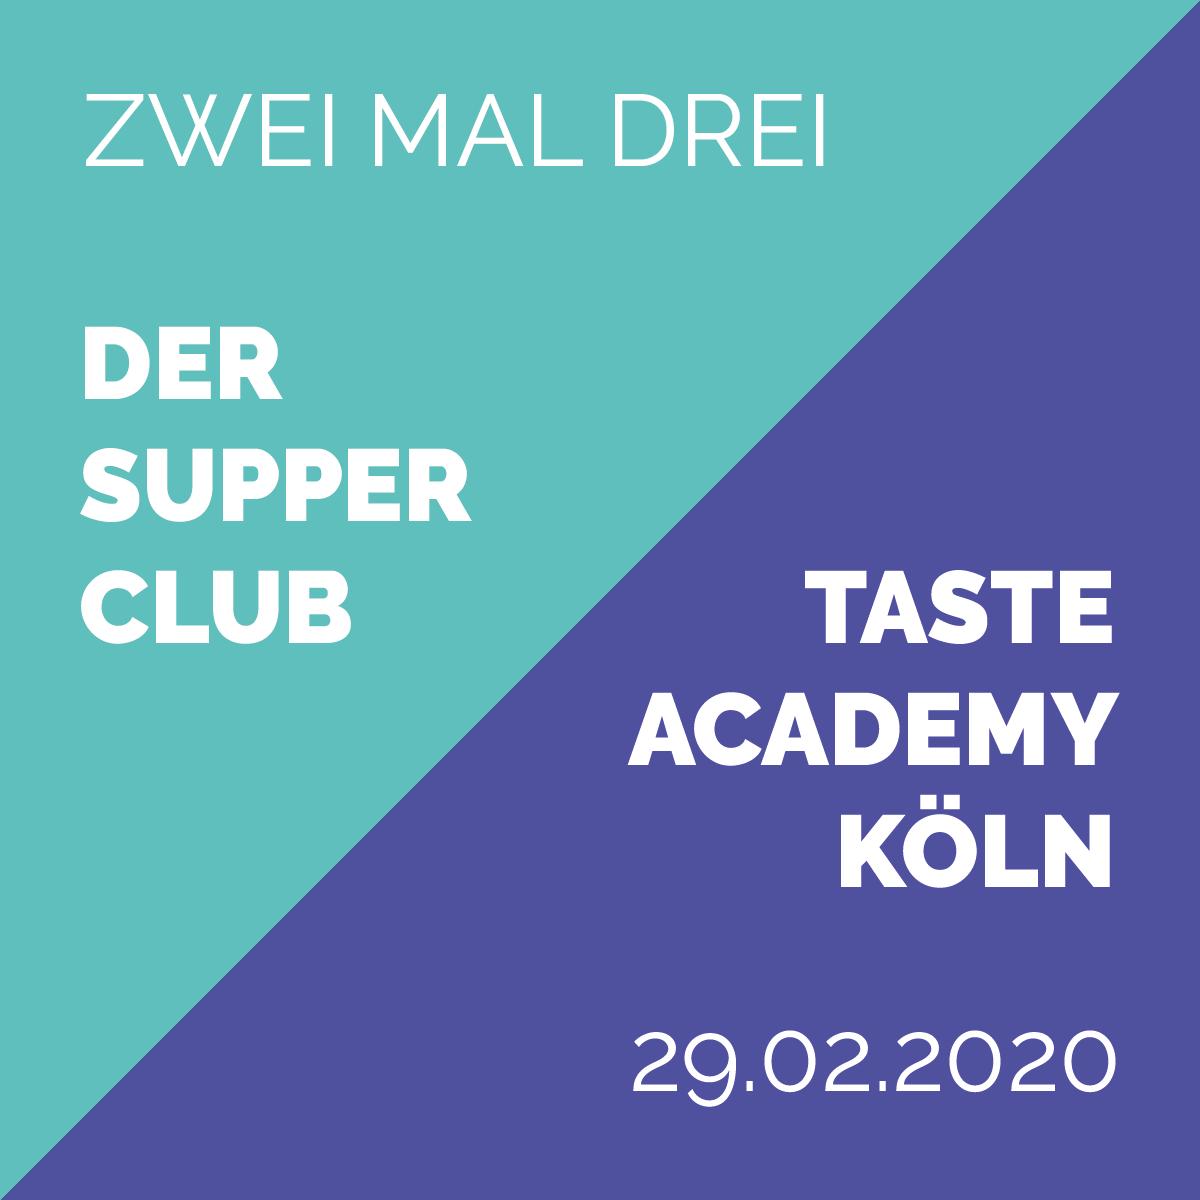 Zwei mal drei - Der Supper Club Februar 2020